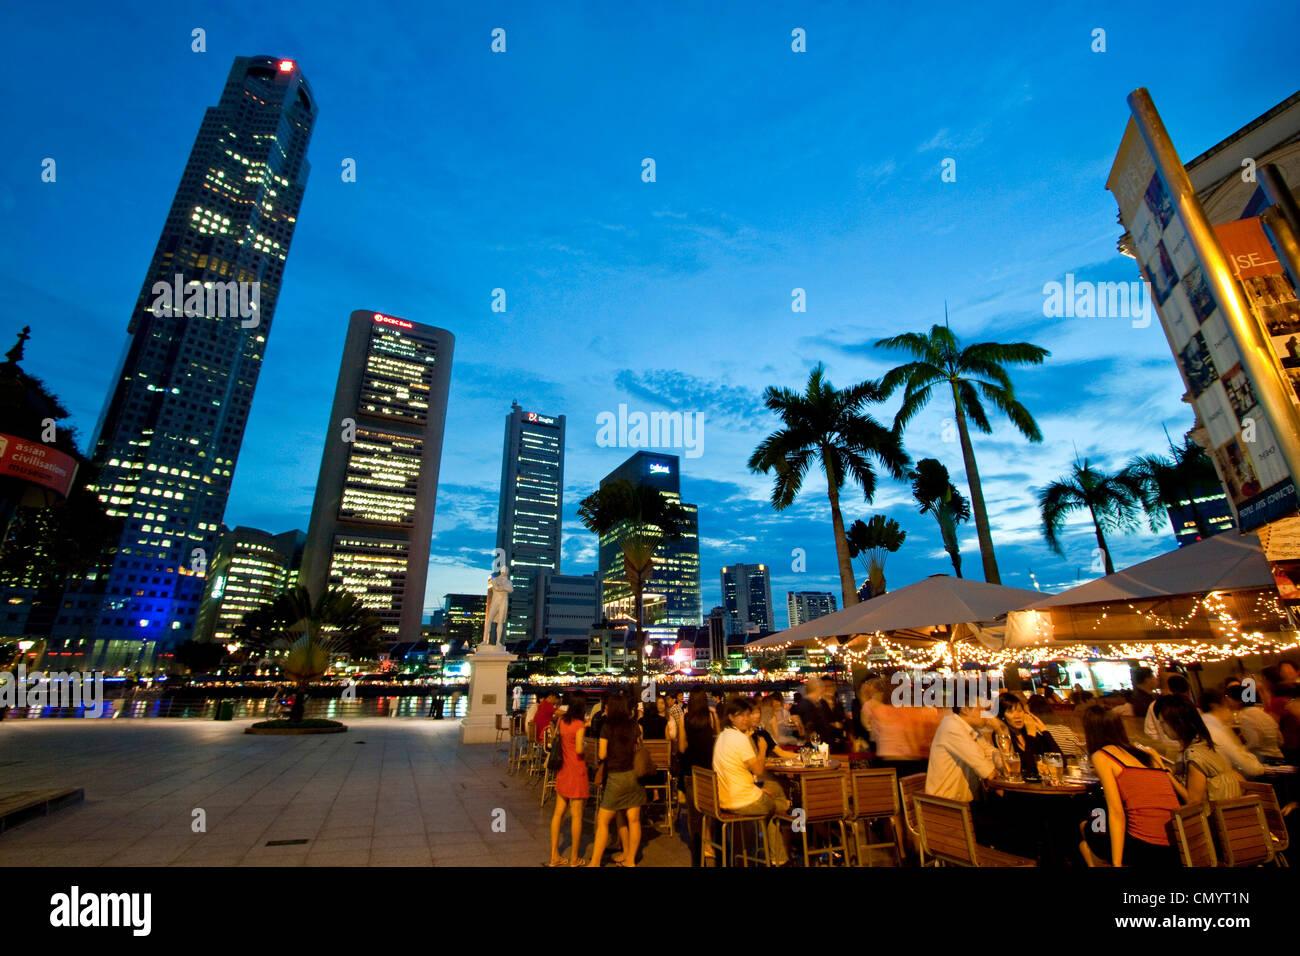 Skyline of Singapur, Raffles Statue, street cafe, South East Asia, twilight Stock Photo